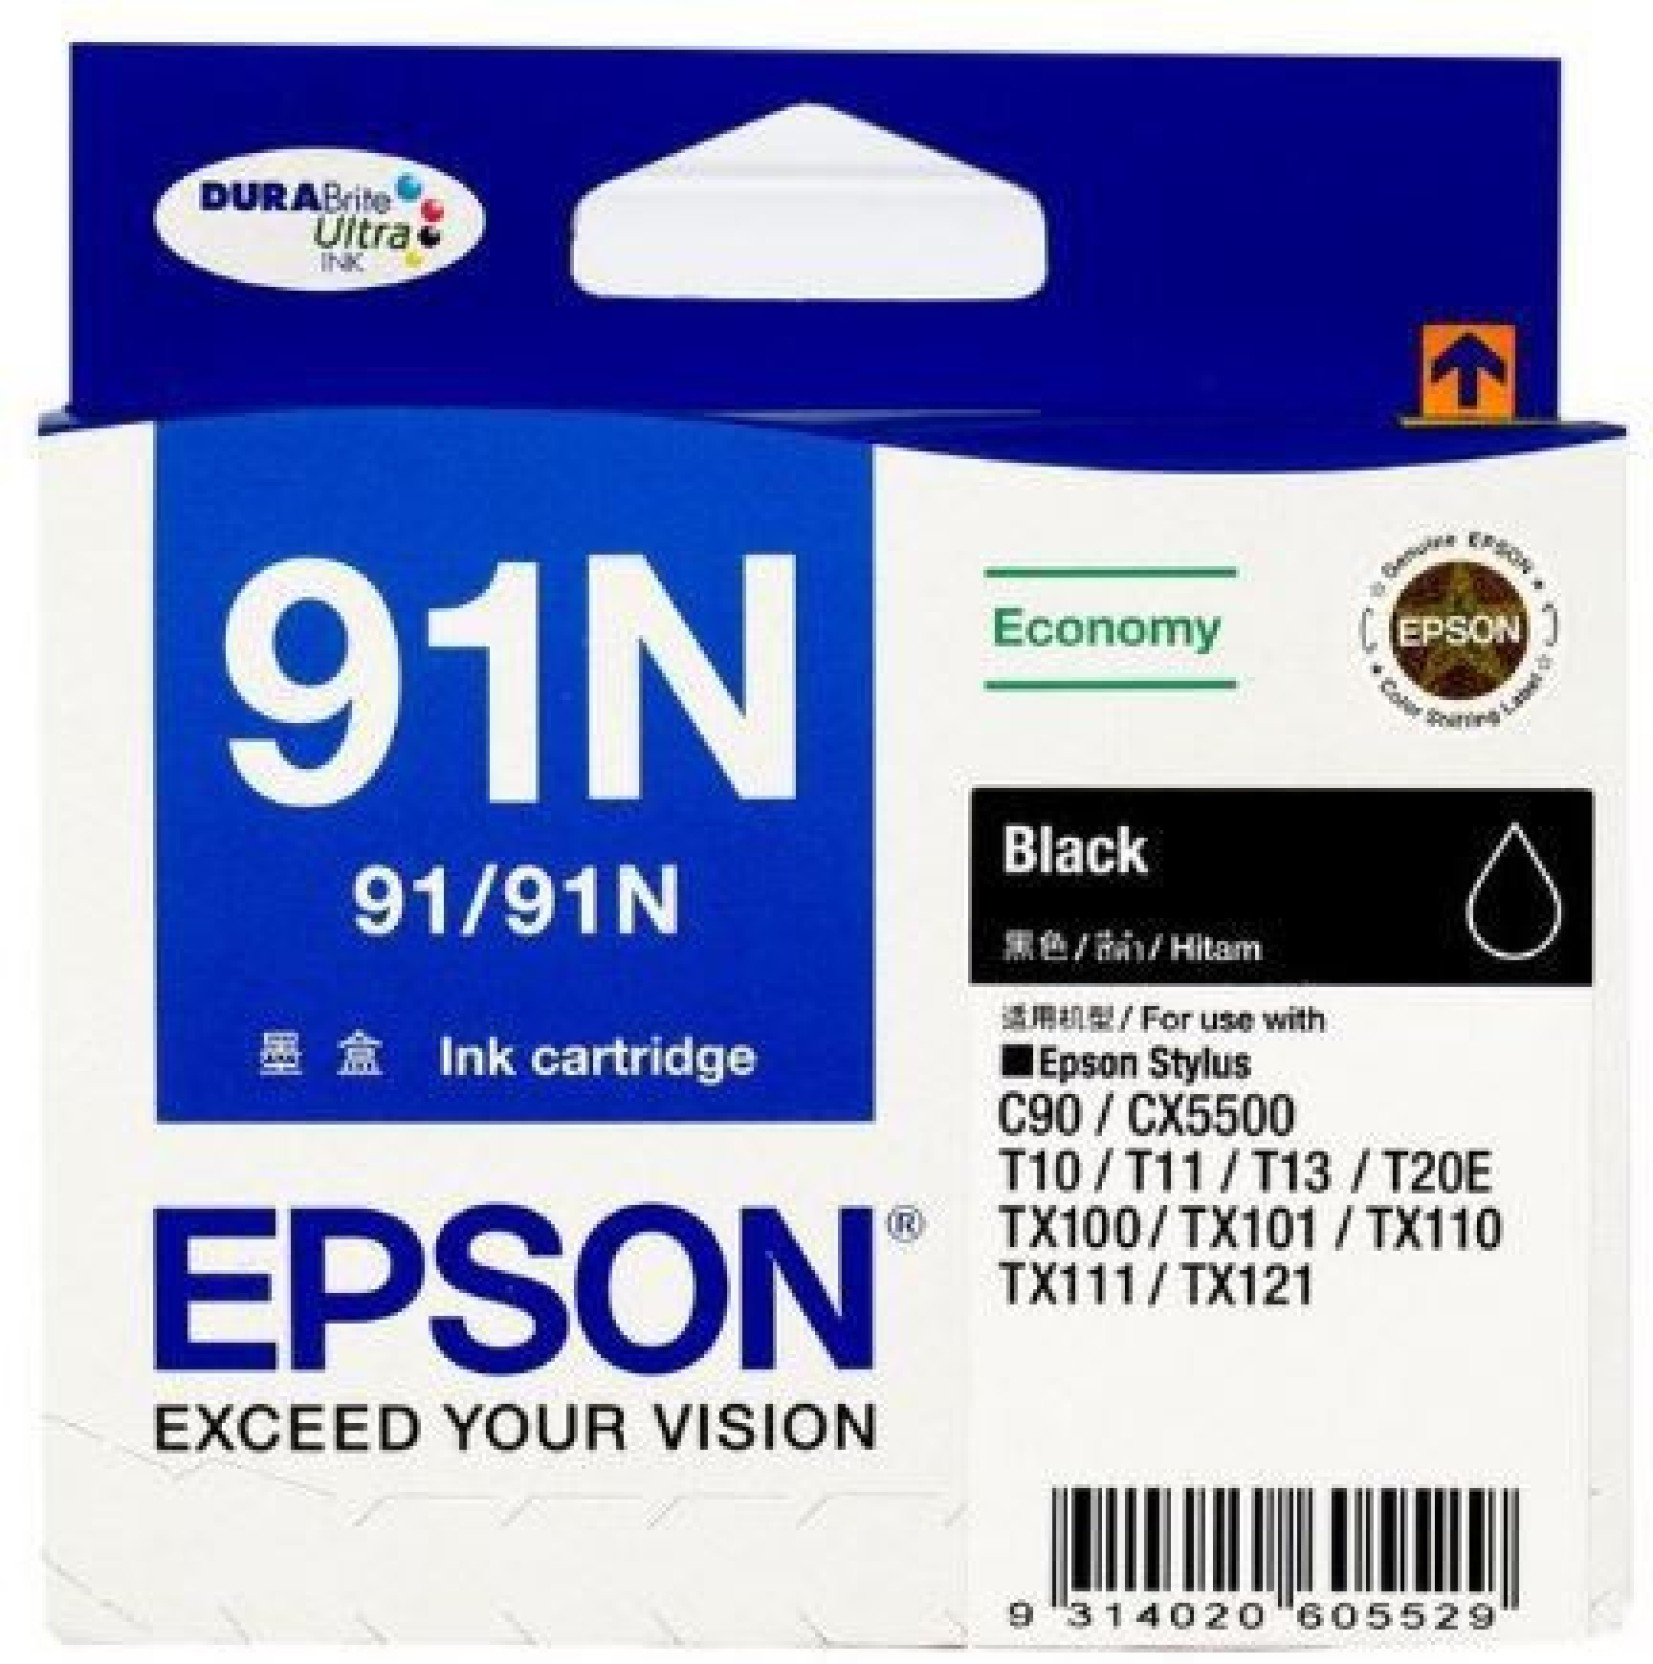 Epson 91 N BLACK Multi Color Ink Cartridge ADD TO CART